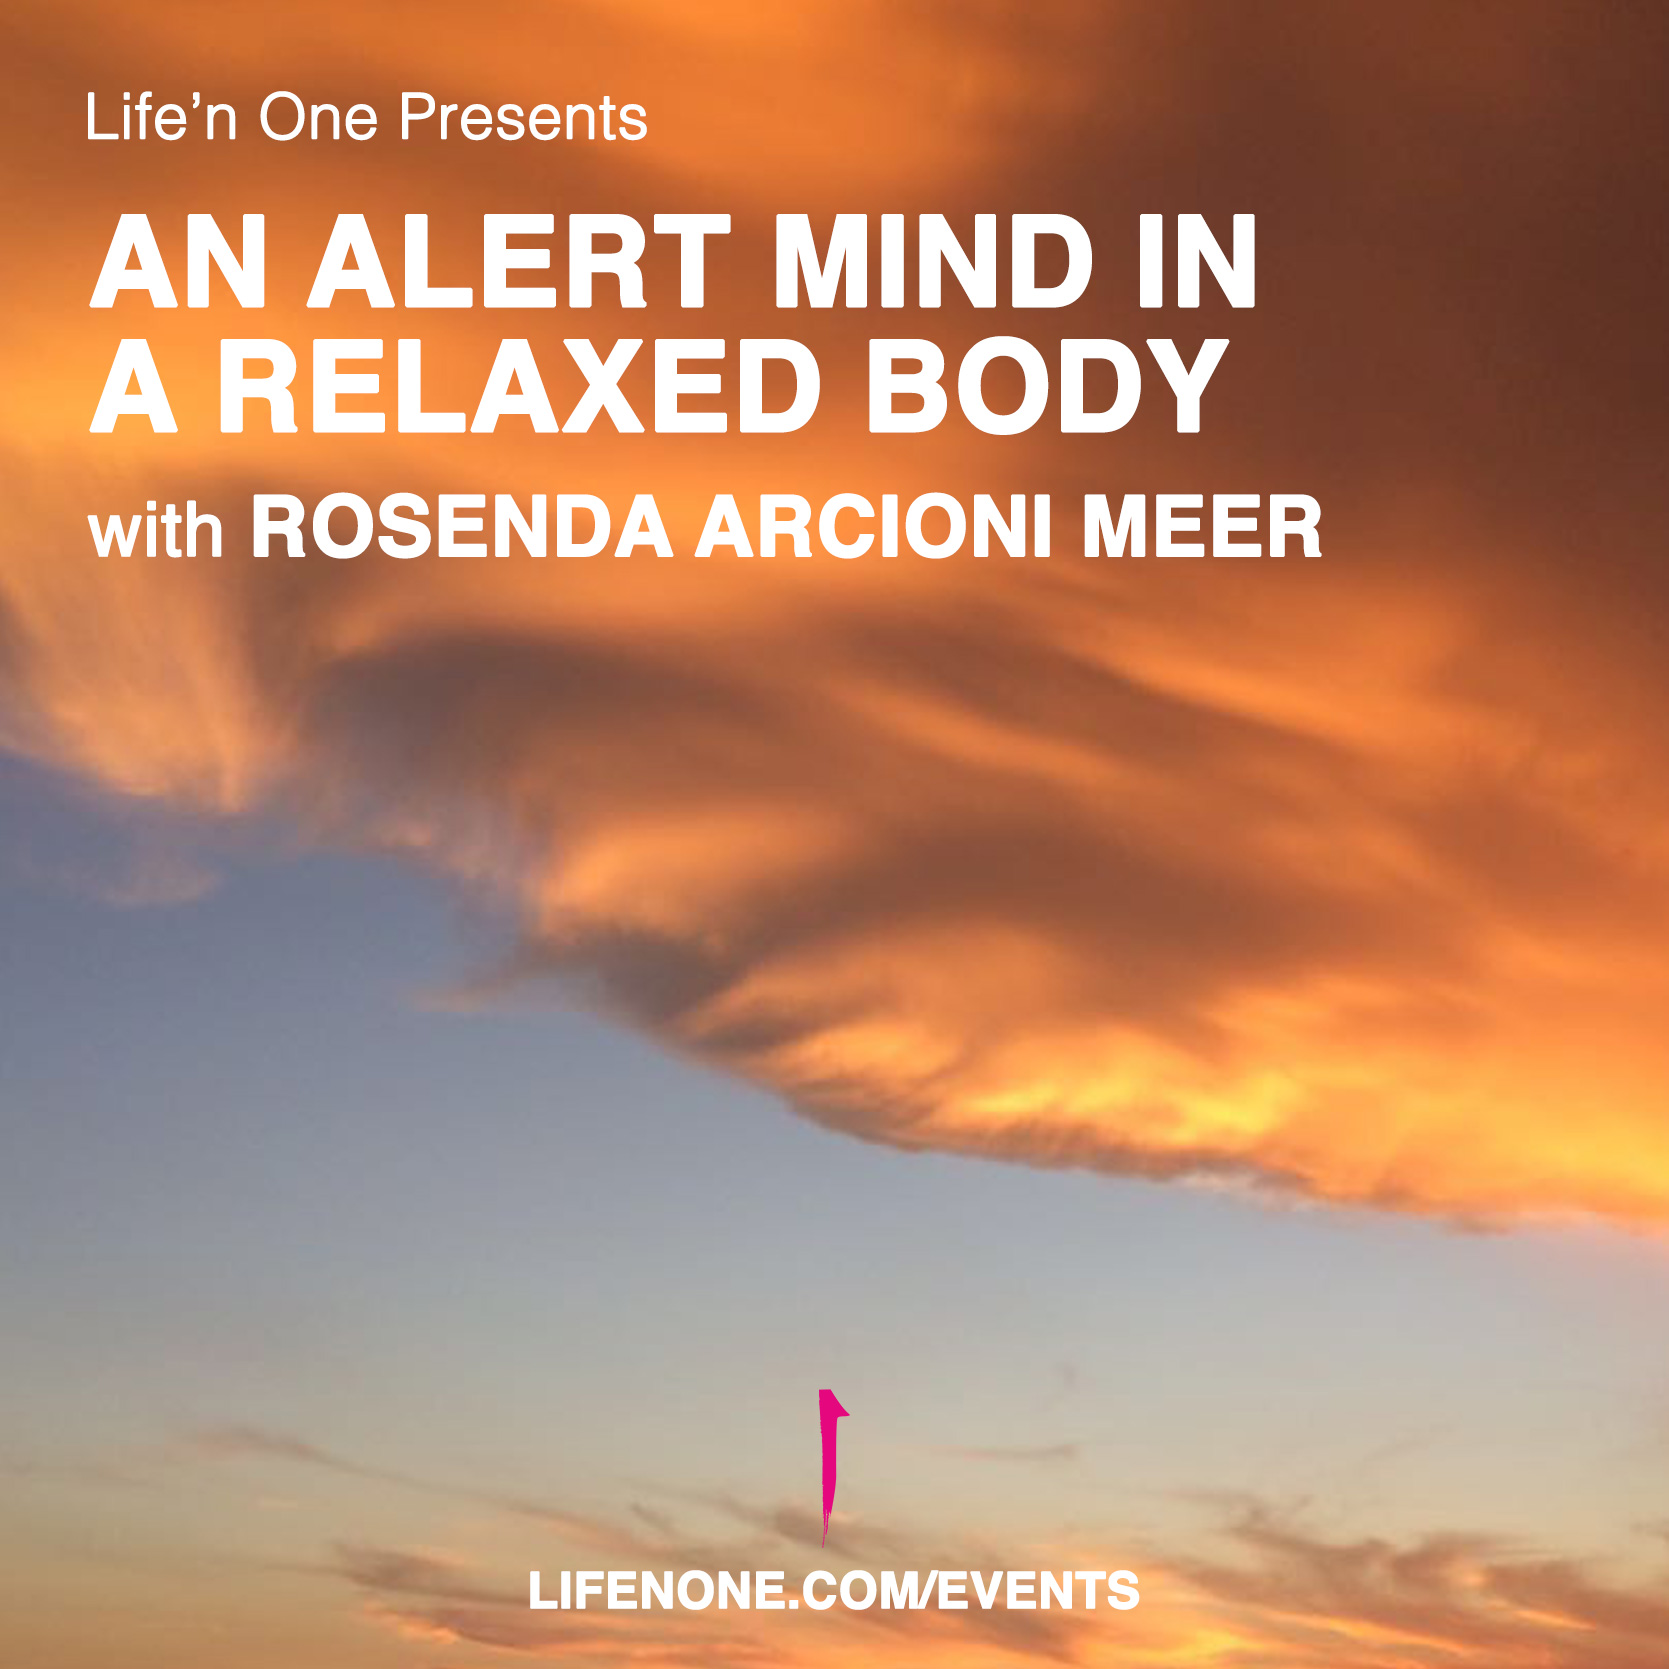 april10-Rosenda-An-Alert-Mind-in-a-Relaxed-Body.jpg